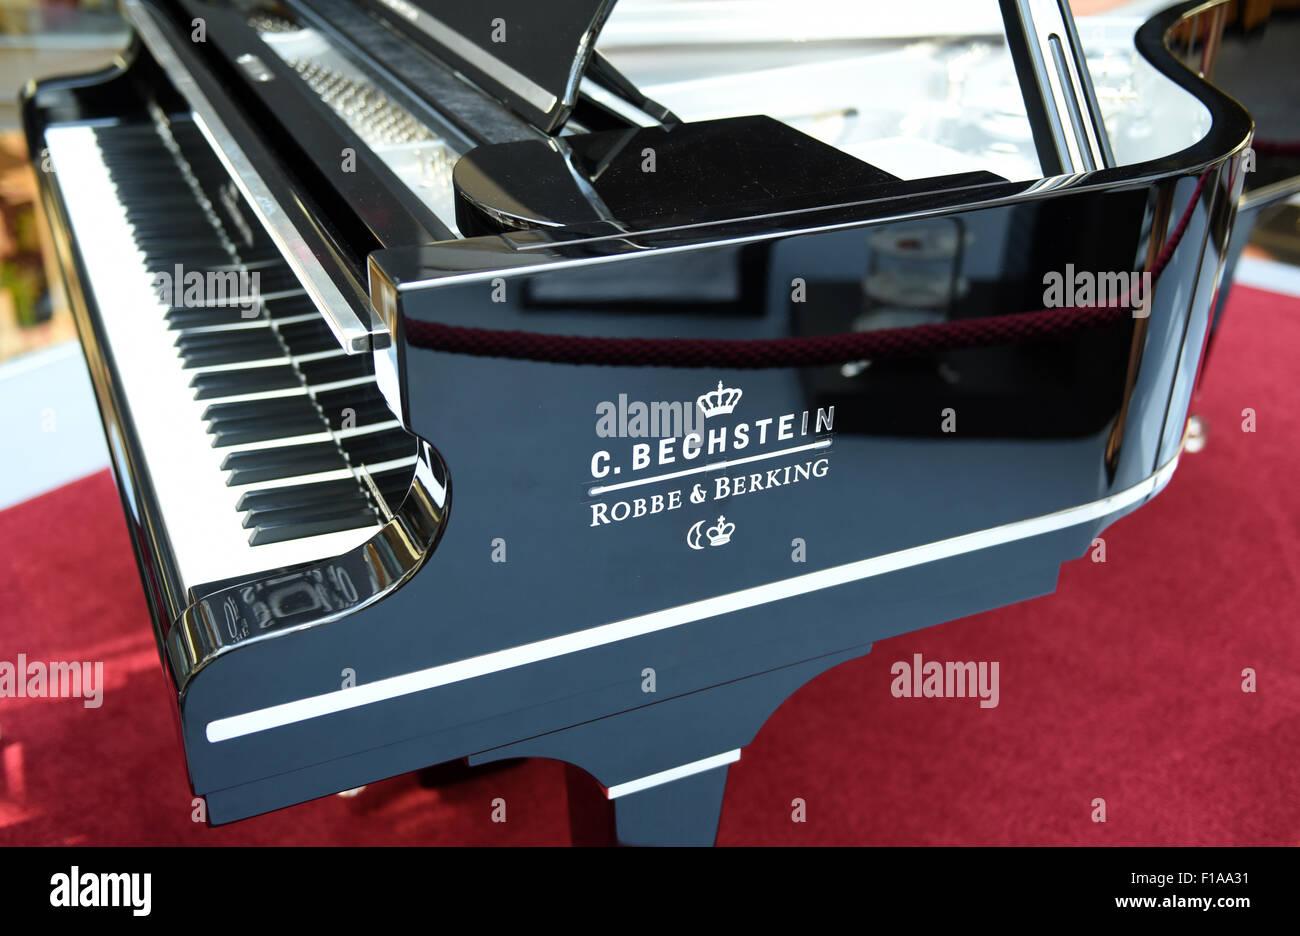 Tolle Pianoforte Draht Fotos - Elektrische Schaltplan-Ideen ...